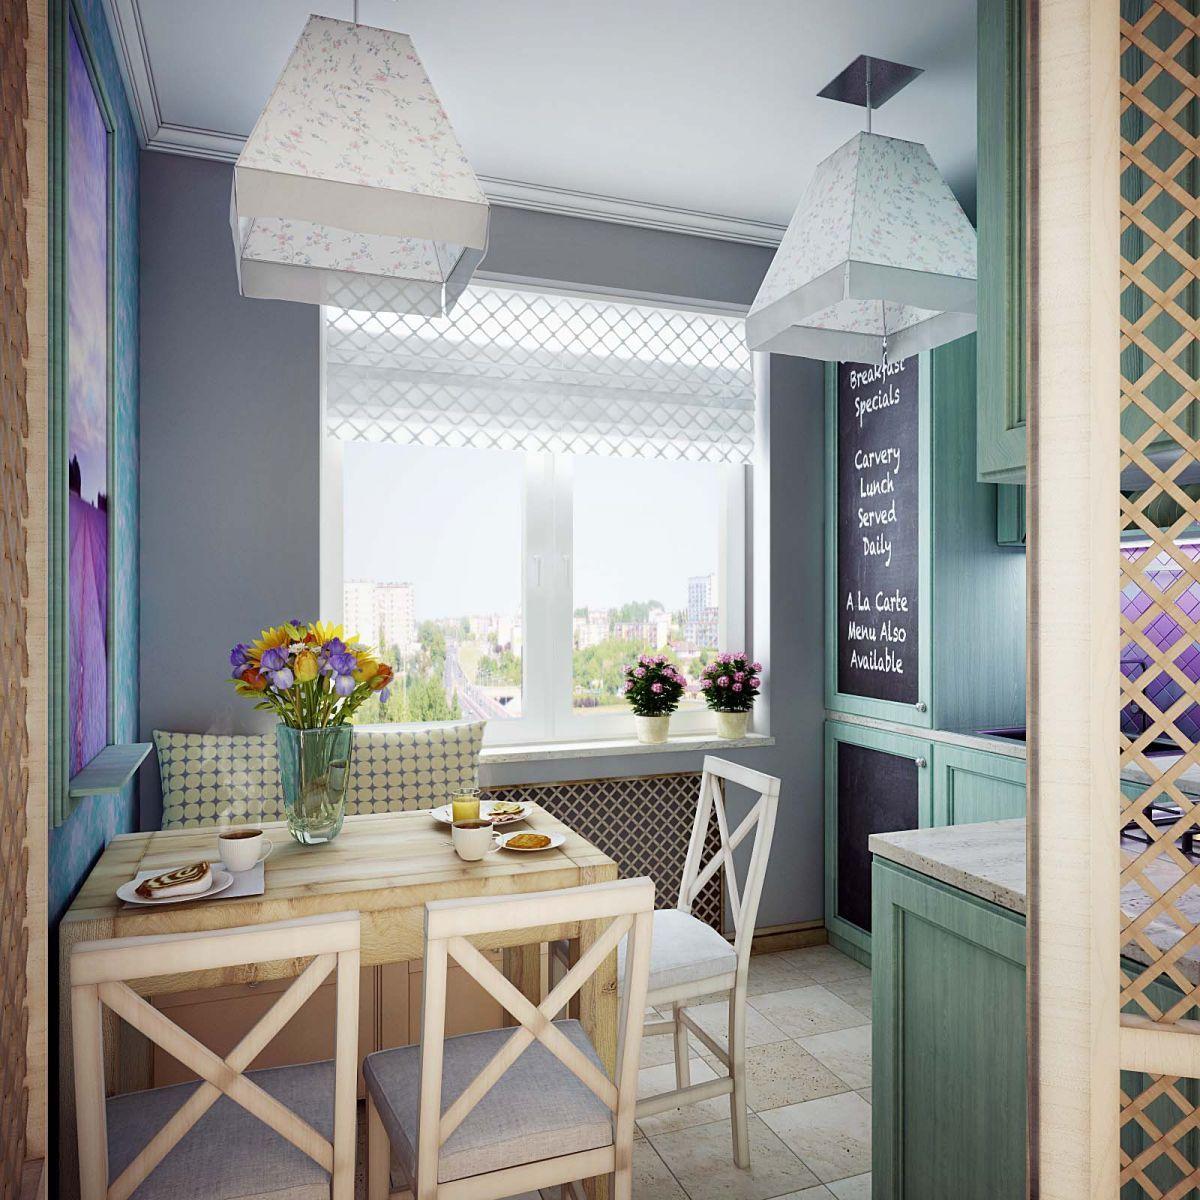 дизайн проект кухни в стиле прованс кухня в стиле провансдизайн